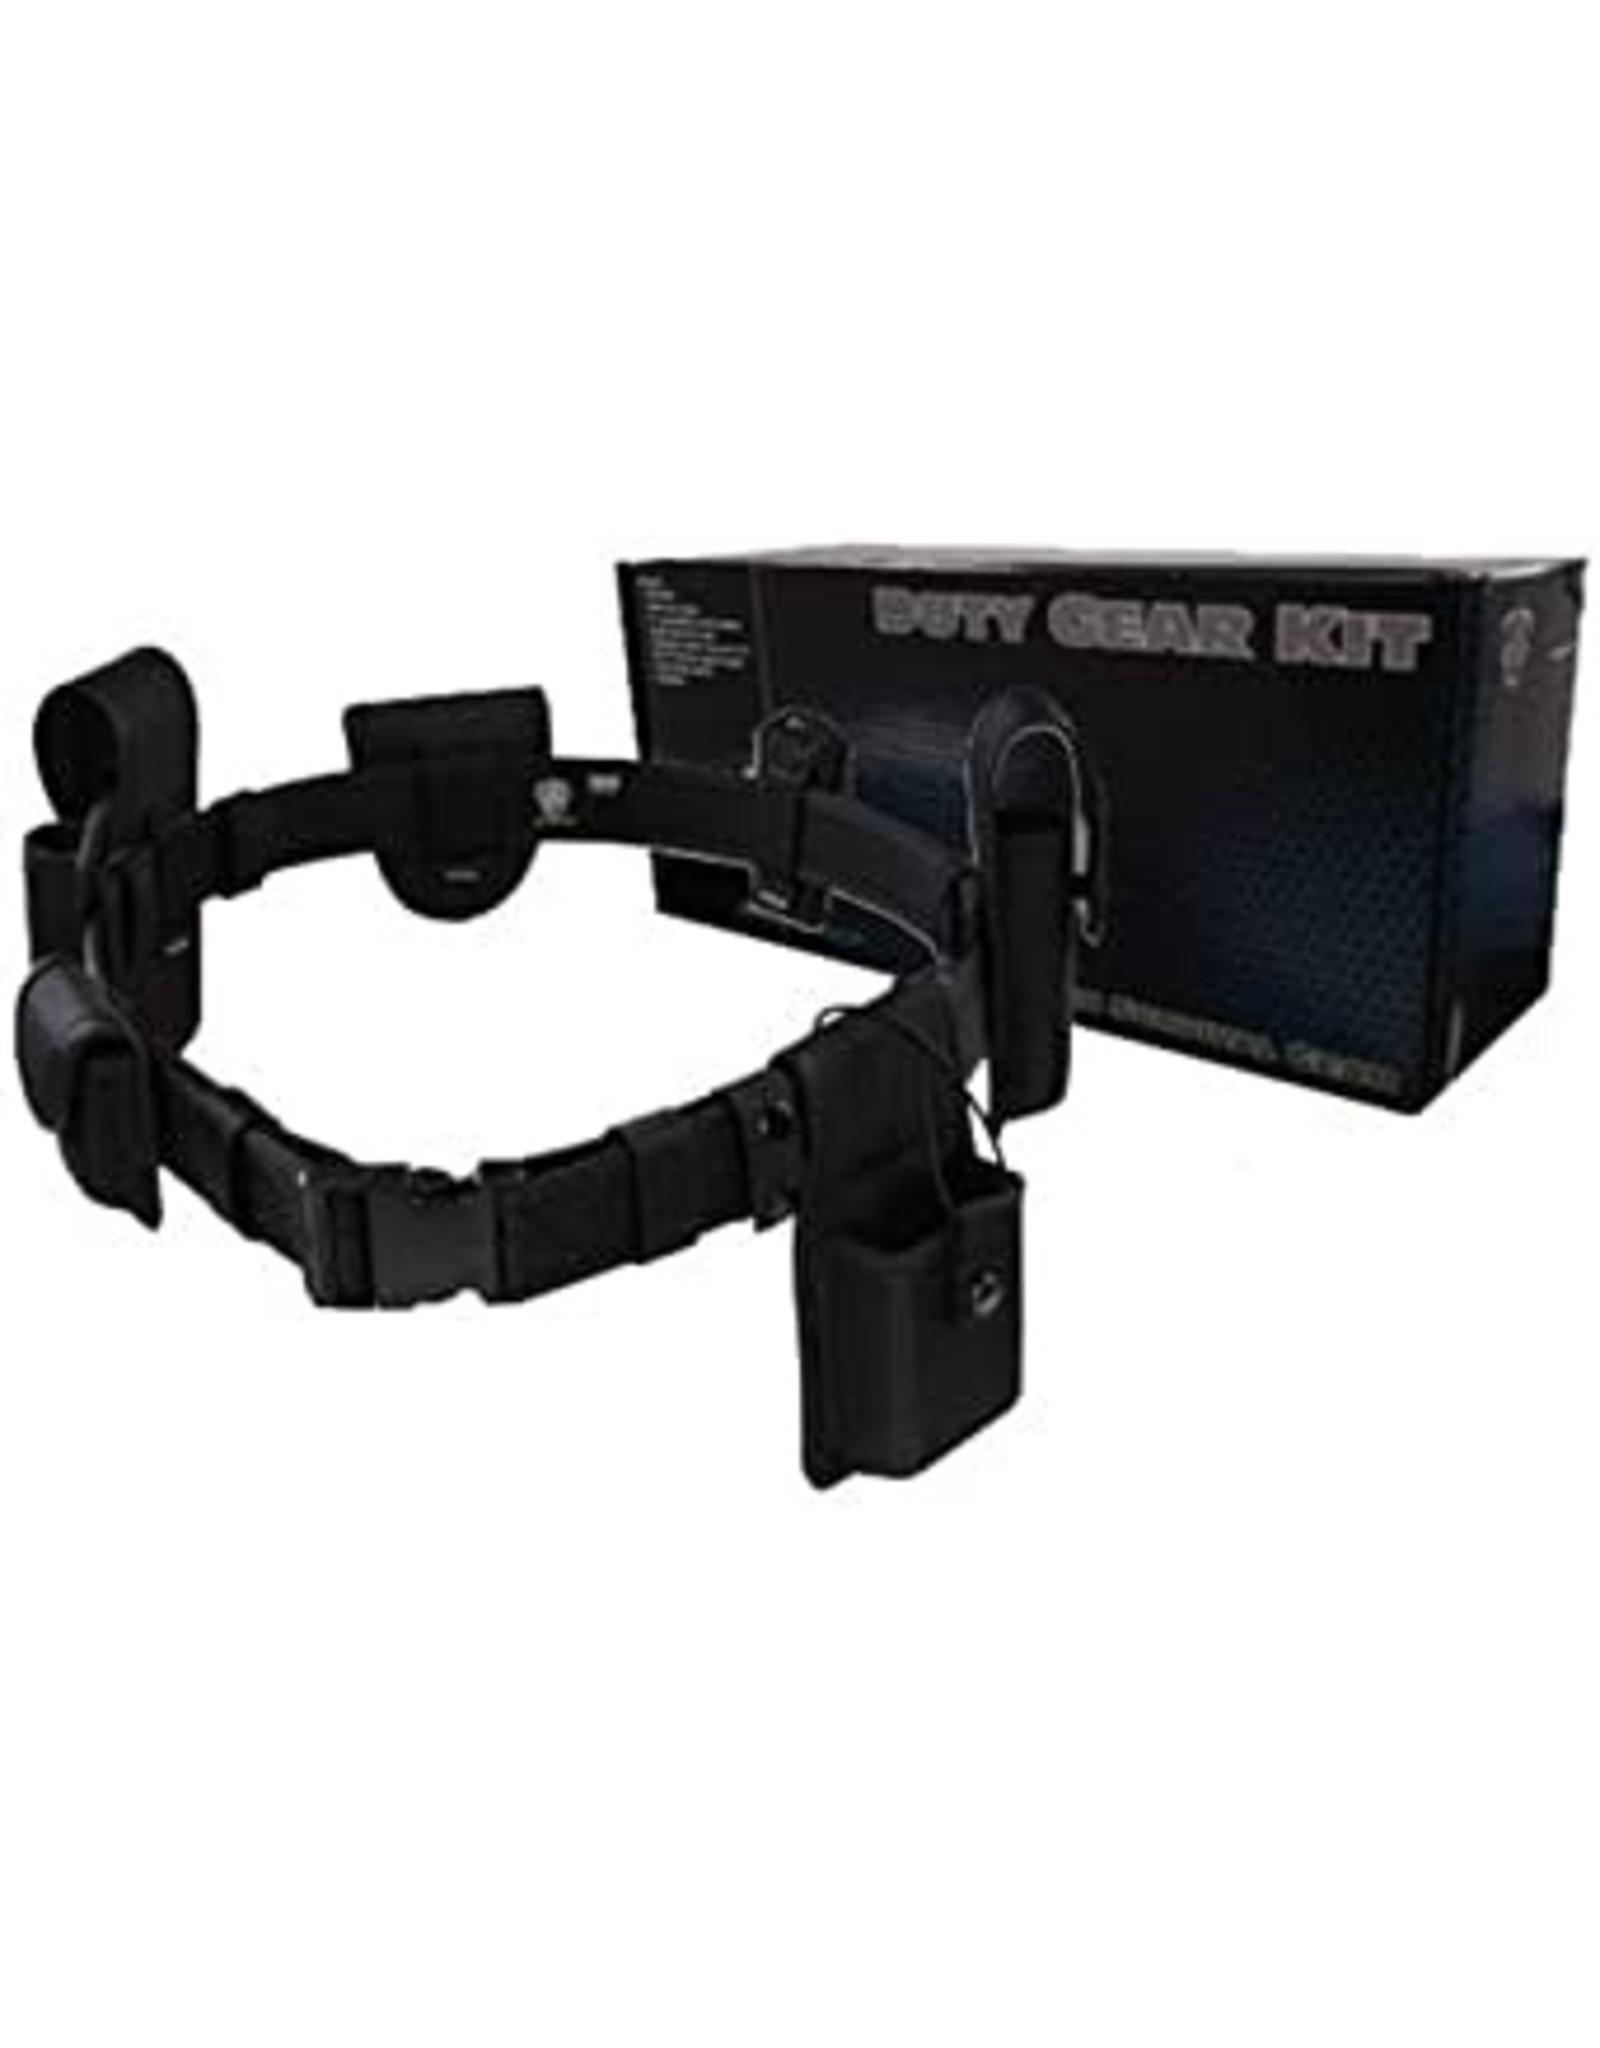 5ive Star Duty Gear Kit XL44-48